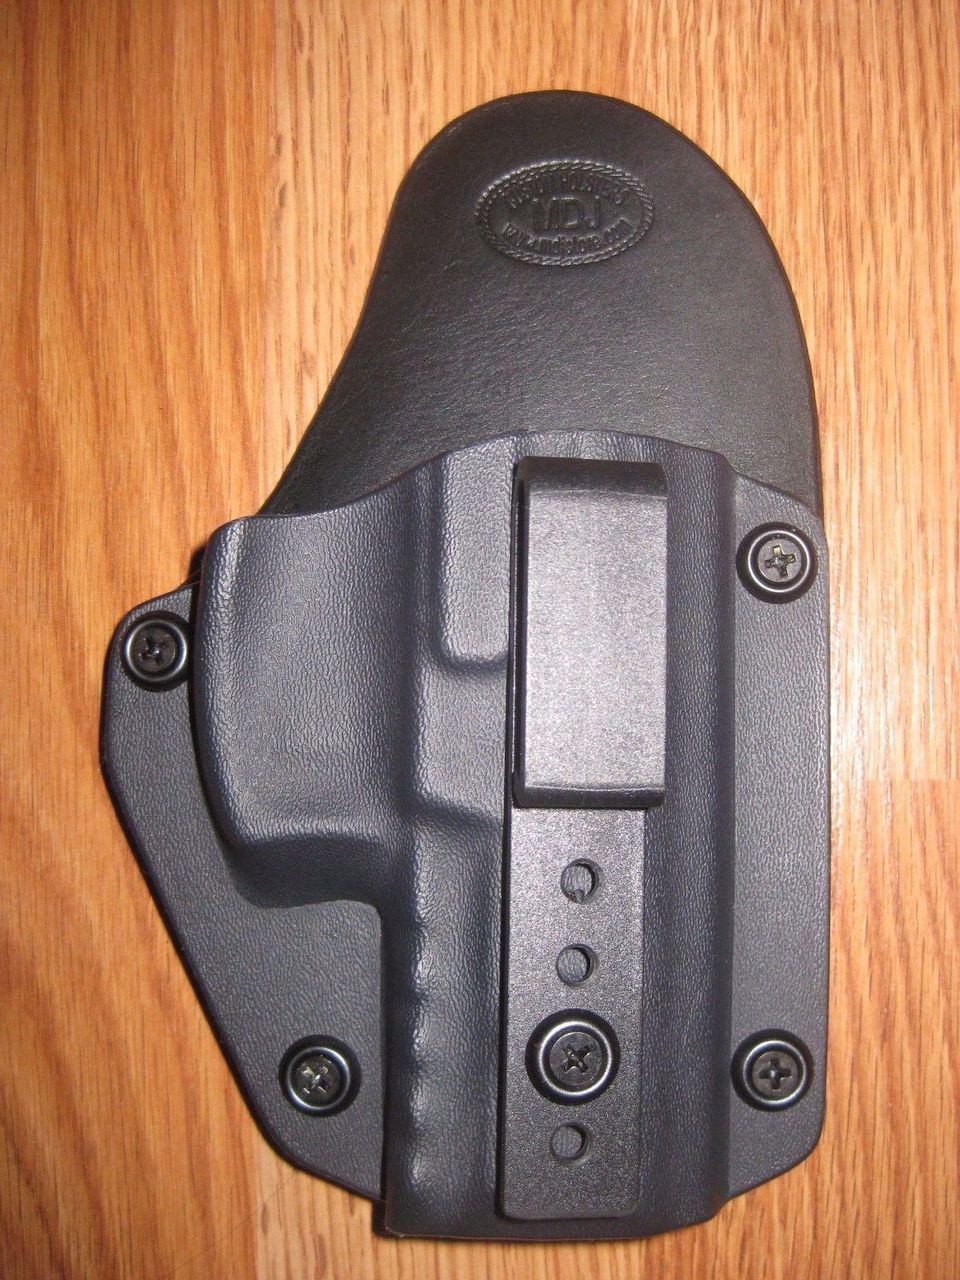 GLOCK IWB Small Printhybrid leather\Kydex Holster (Adjustable retention)